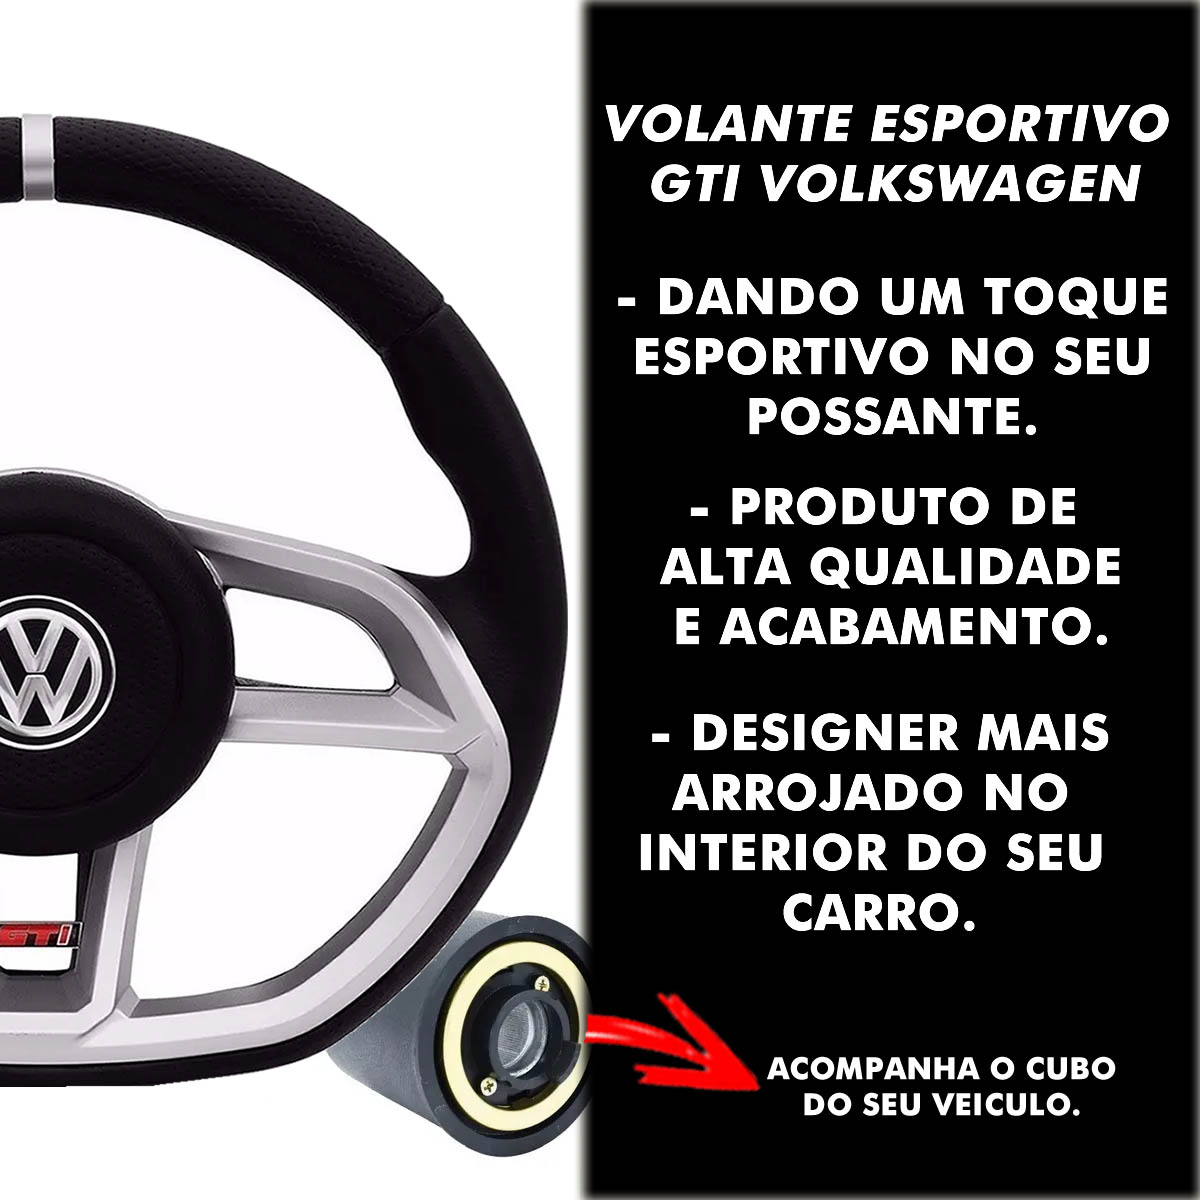 Volante Volkswagen Gti Esportivo Cubo do Gol Quadrado 1980 a 1996 G2 G3 G4 G5 G6 1994 a 2013 Poliparts